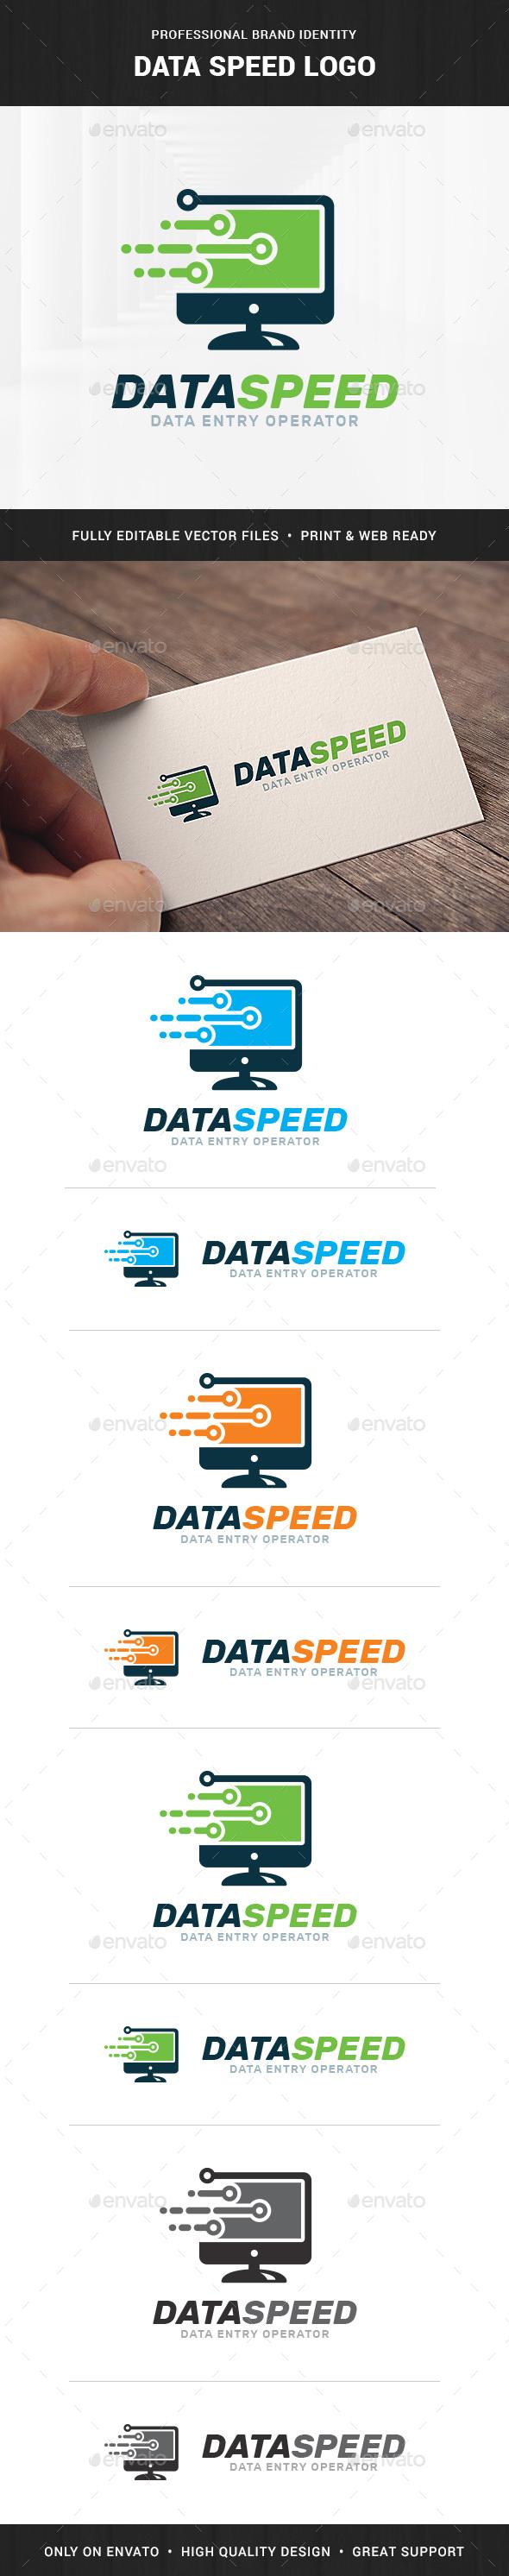 Data Speed Logo Template